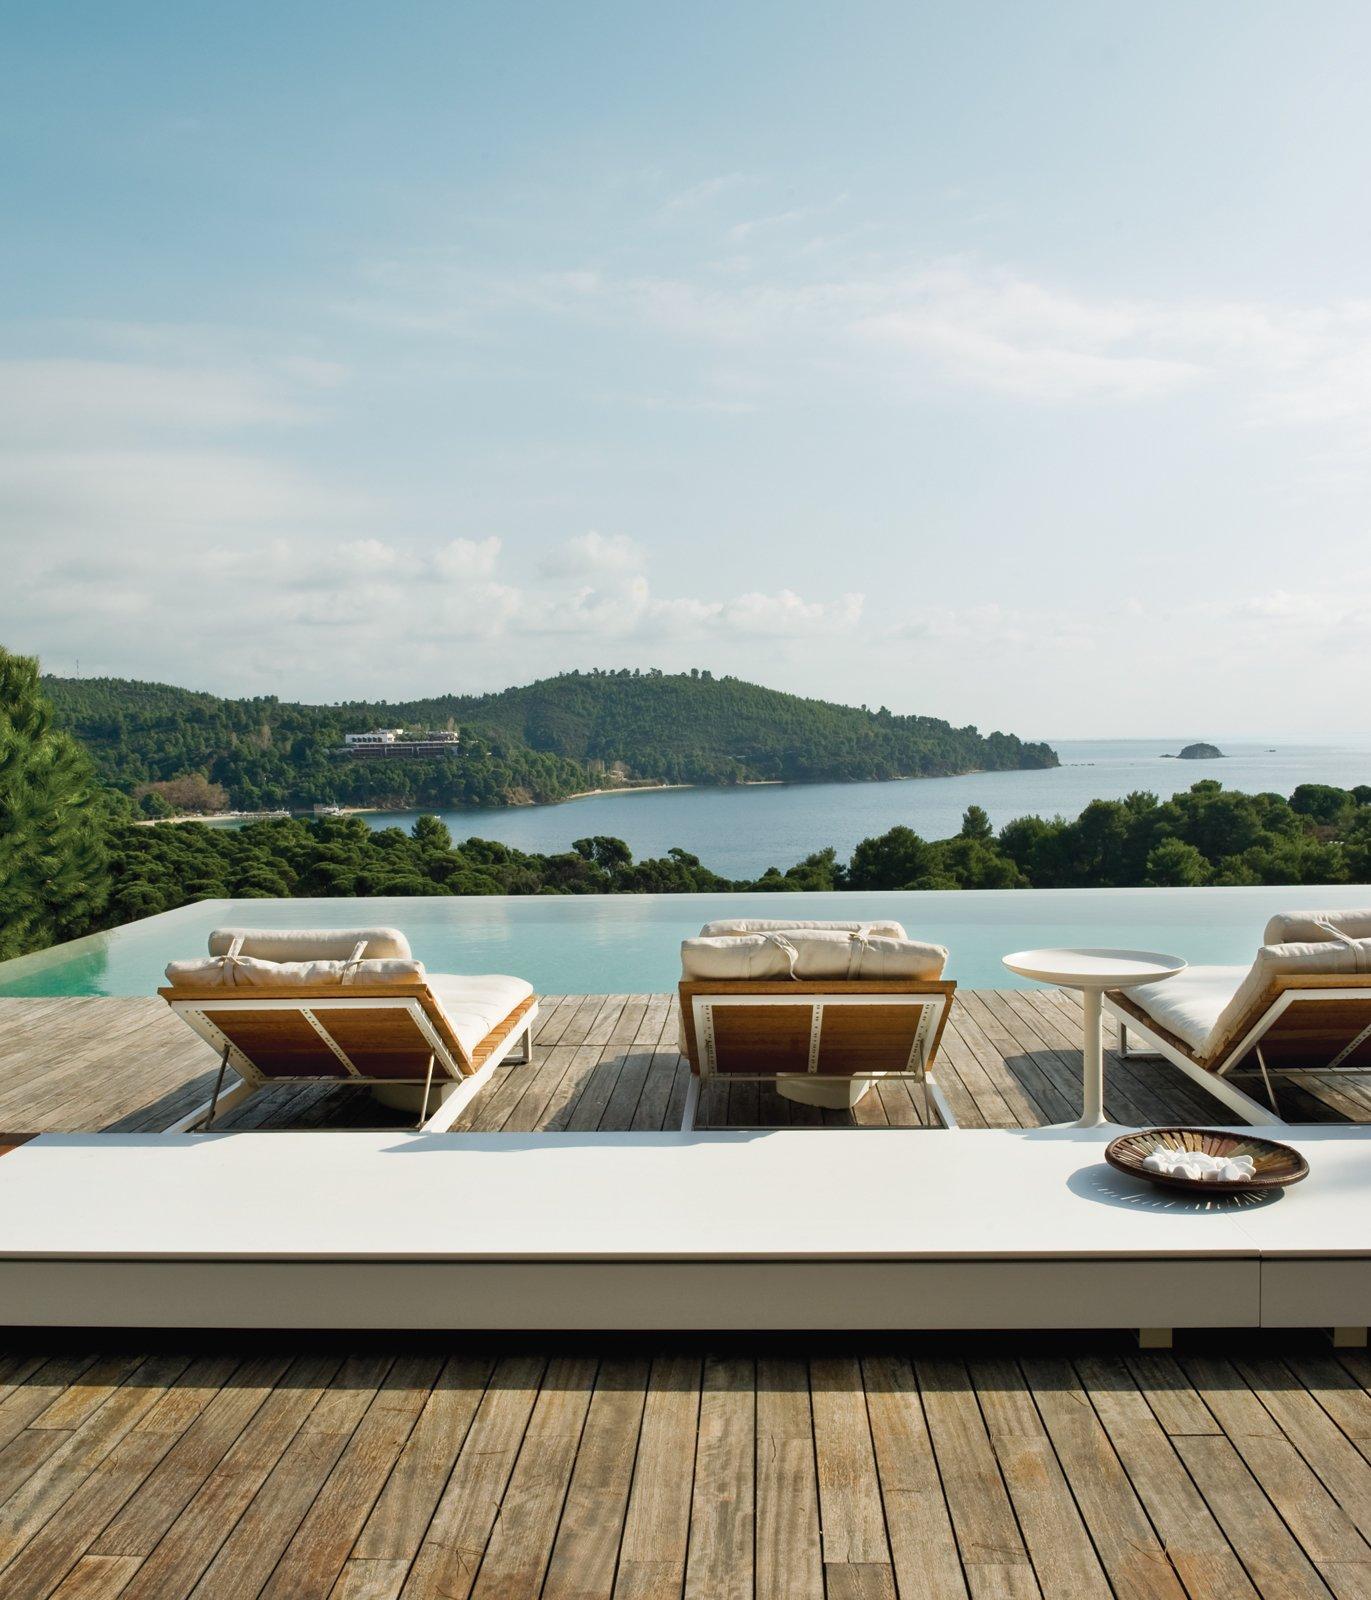 #pooldesign #pool #outdoor #outside #exterior #minimal #modern #midcentury #furniture #vacationhome #sunlounger #Viteo #Pure #DuPont #Skiathos #Greece   Pools